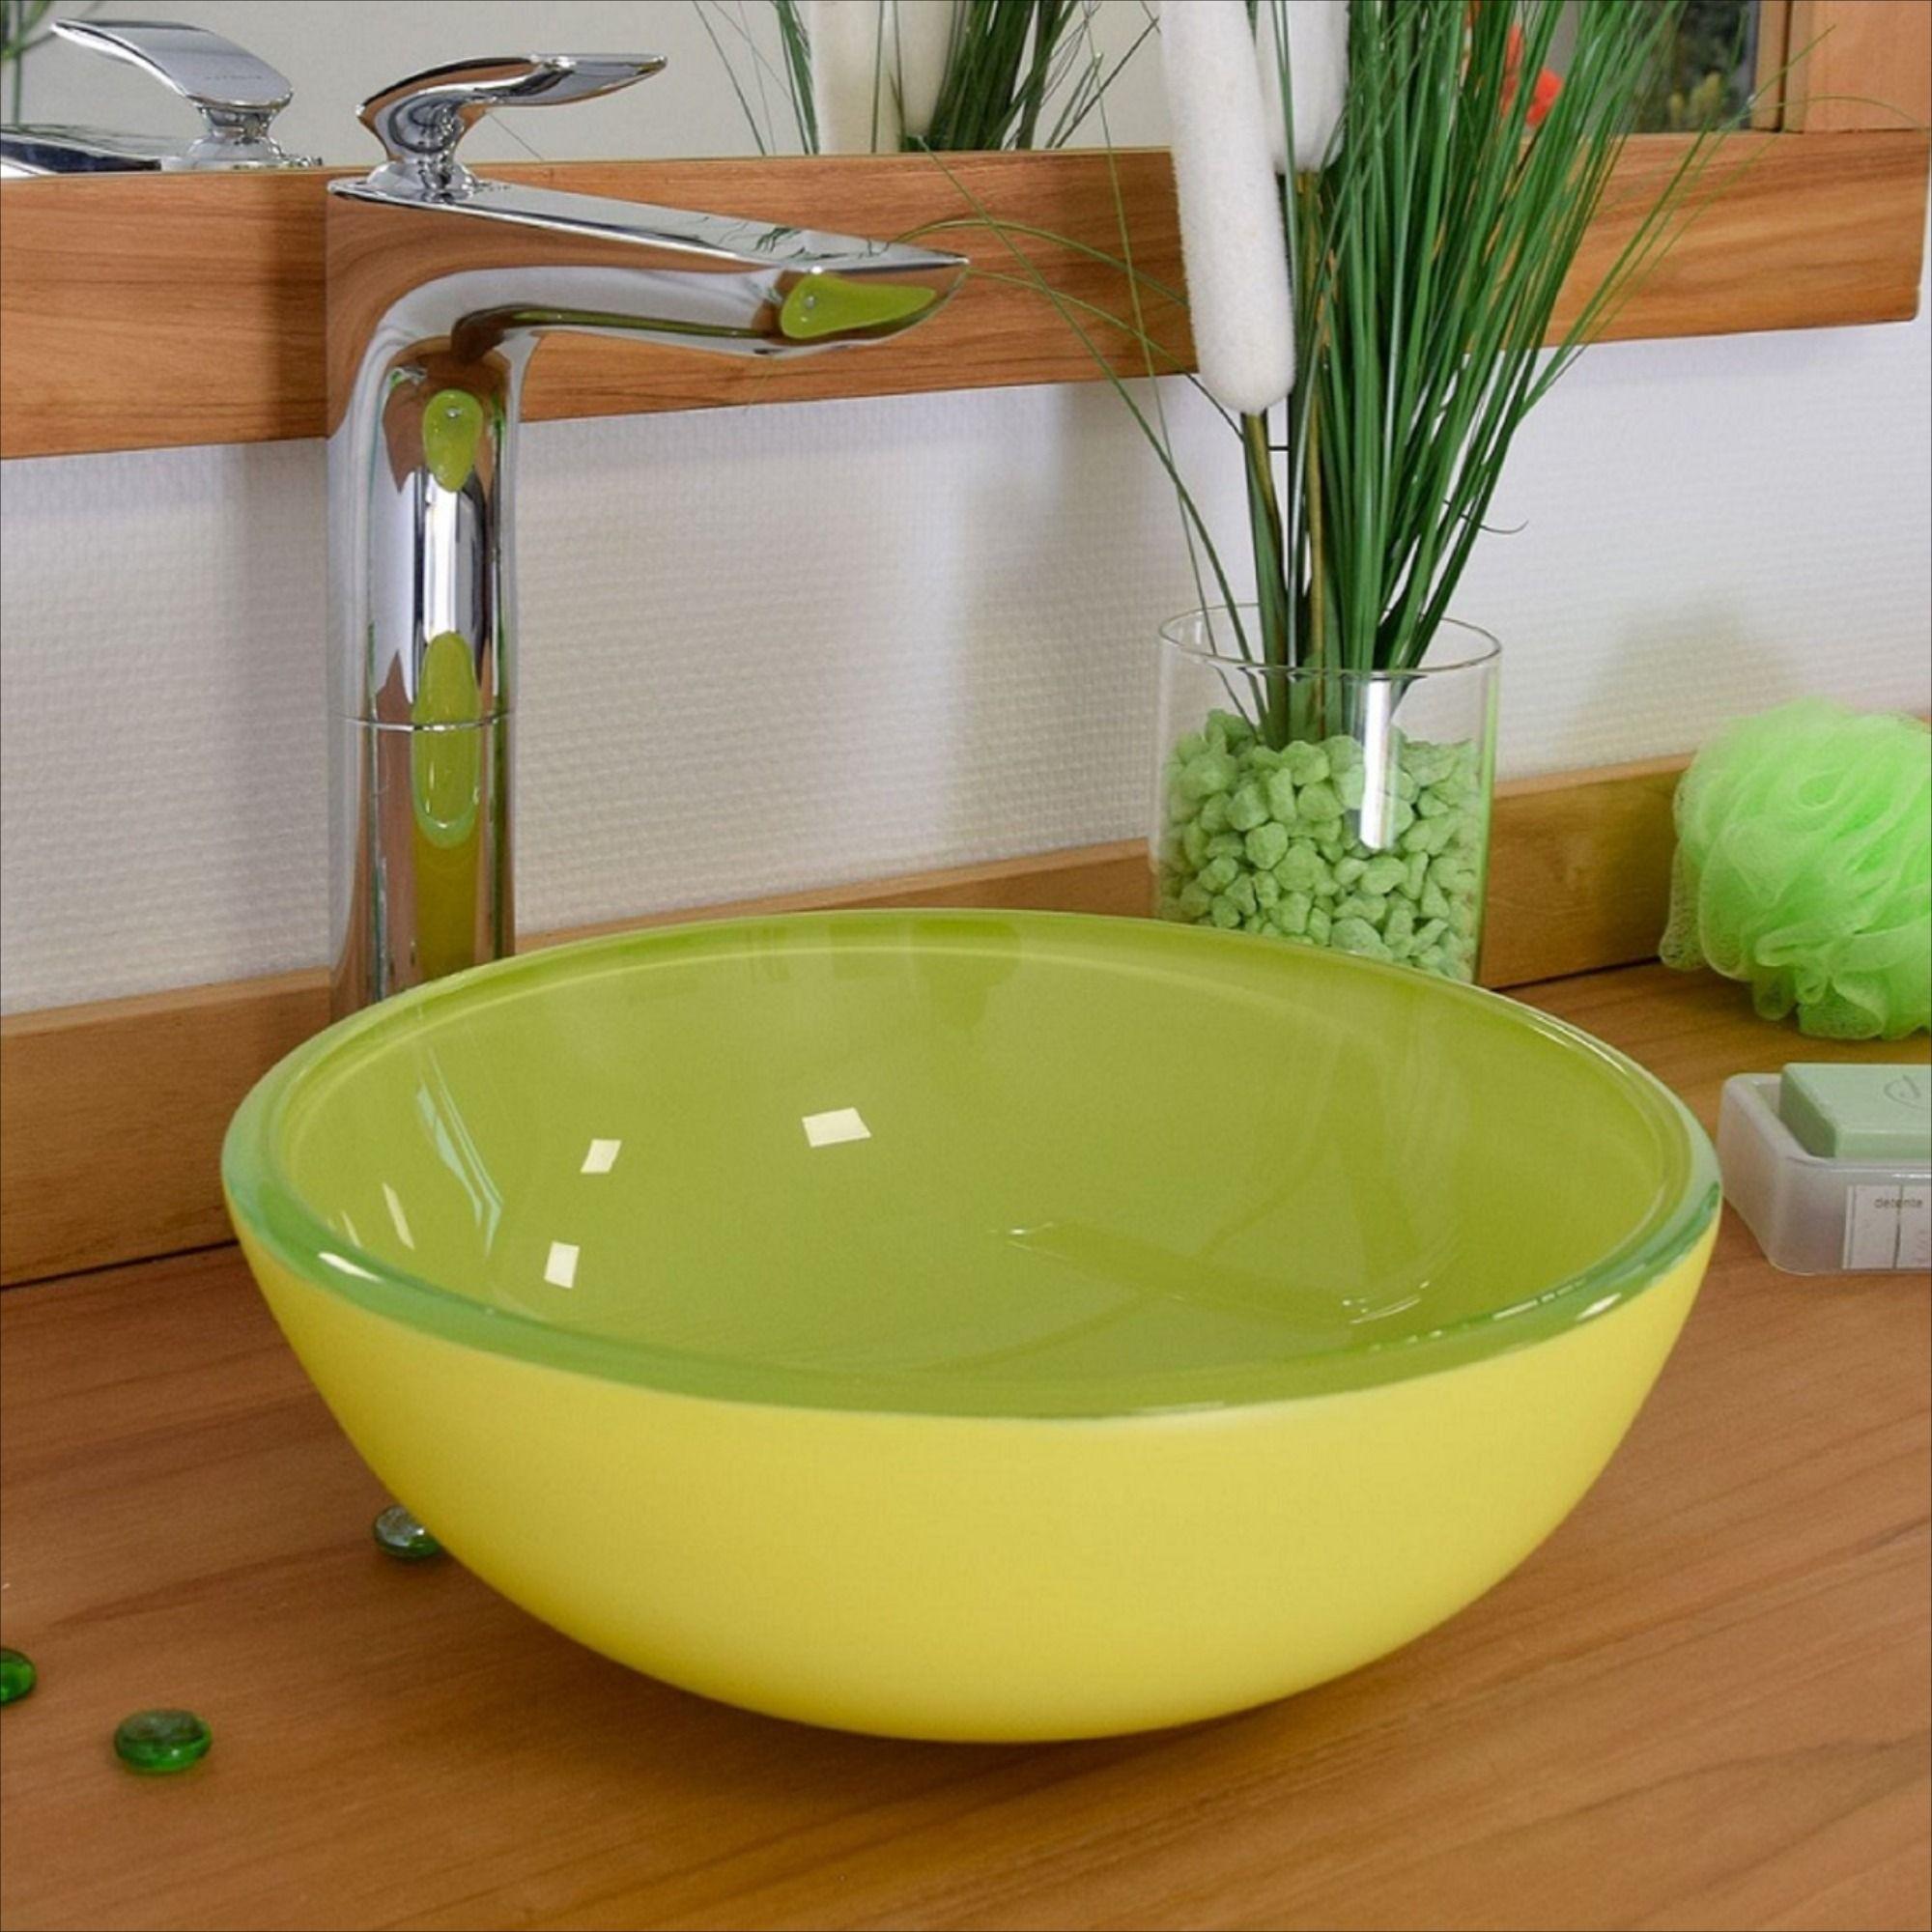 Vasque En Verre Rany En 2020 Vasque En Verre Vasque Salle De Bain Design